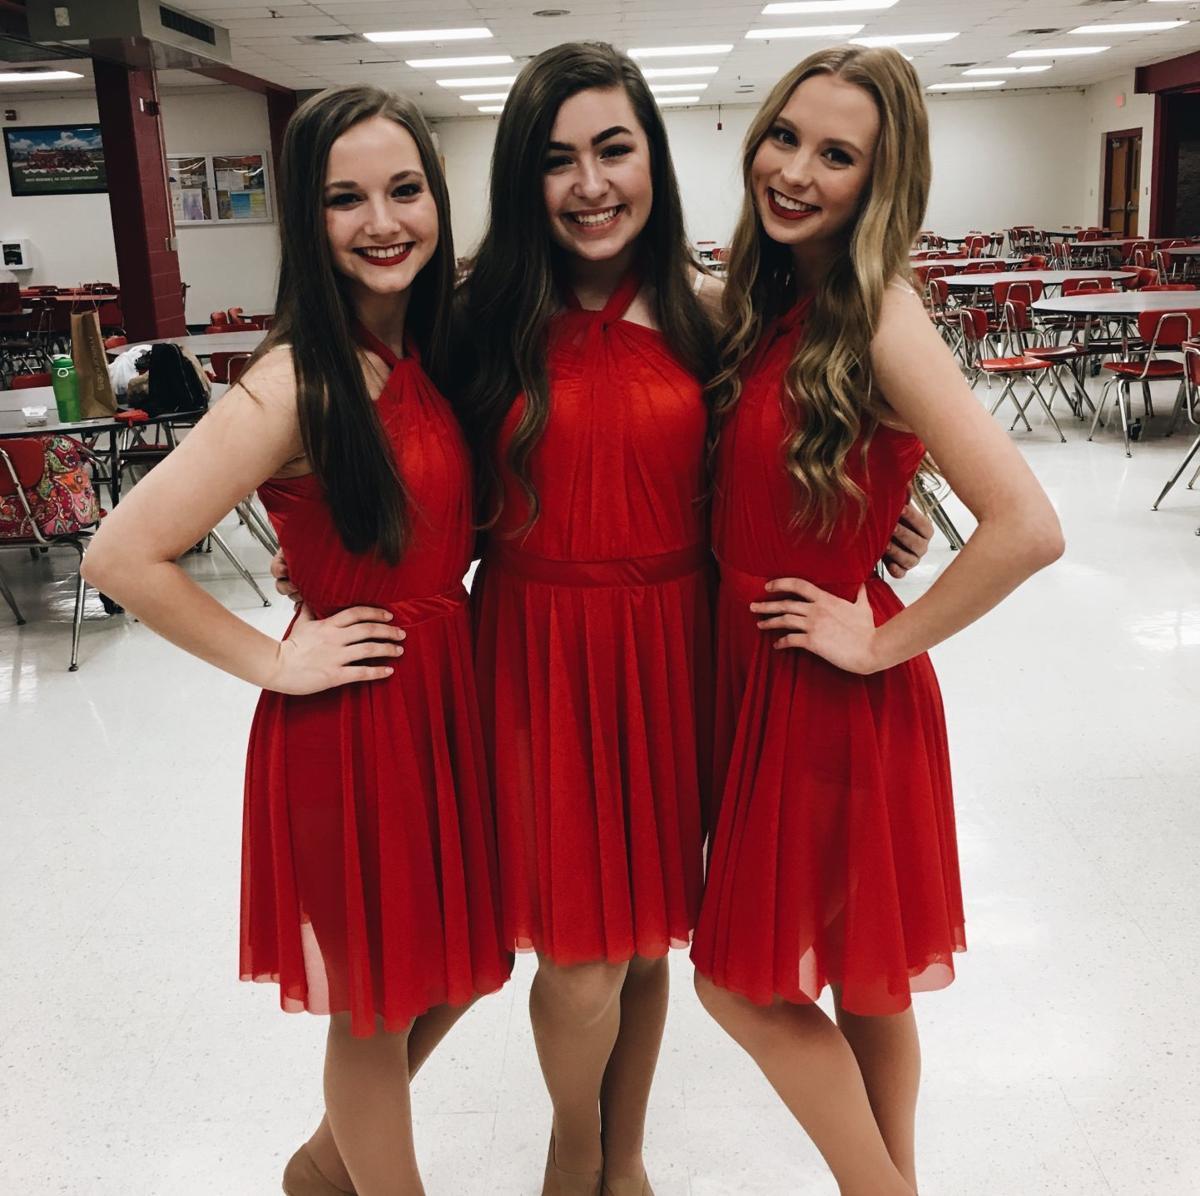 MacKenzie Kress and danceline captains